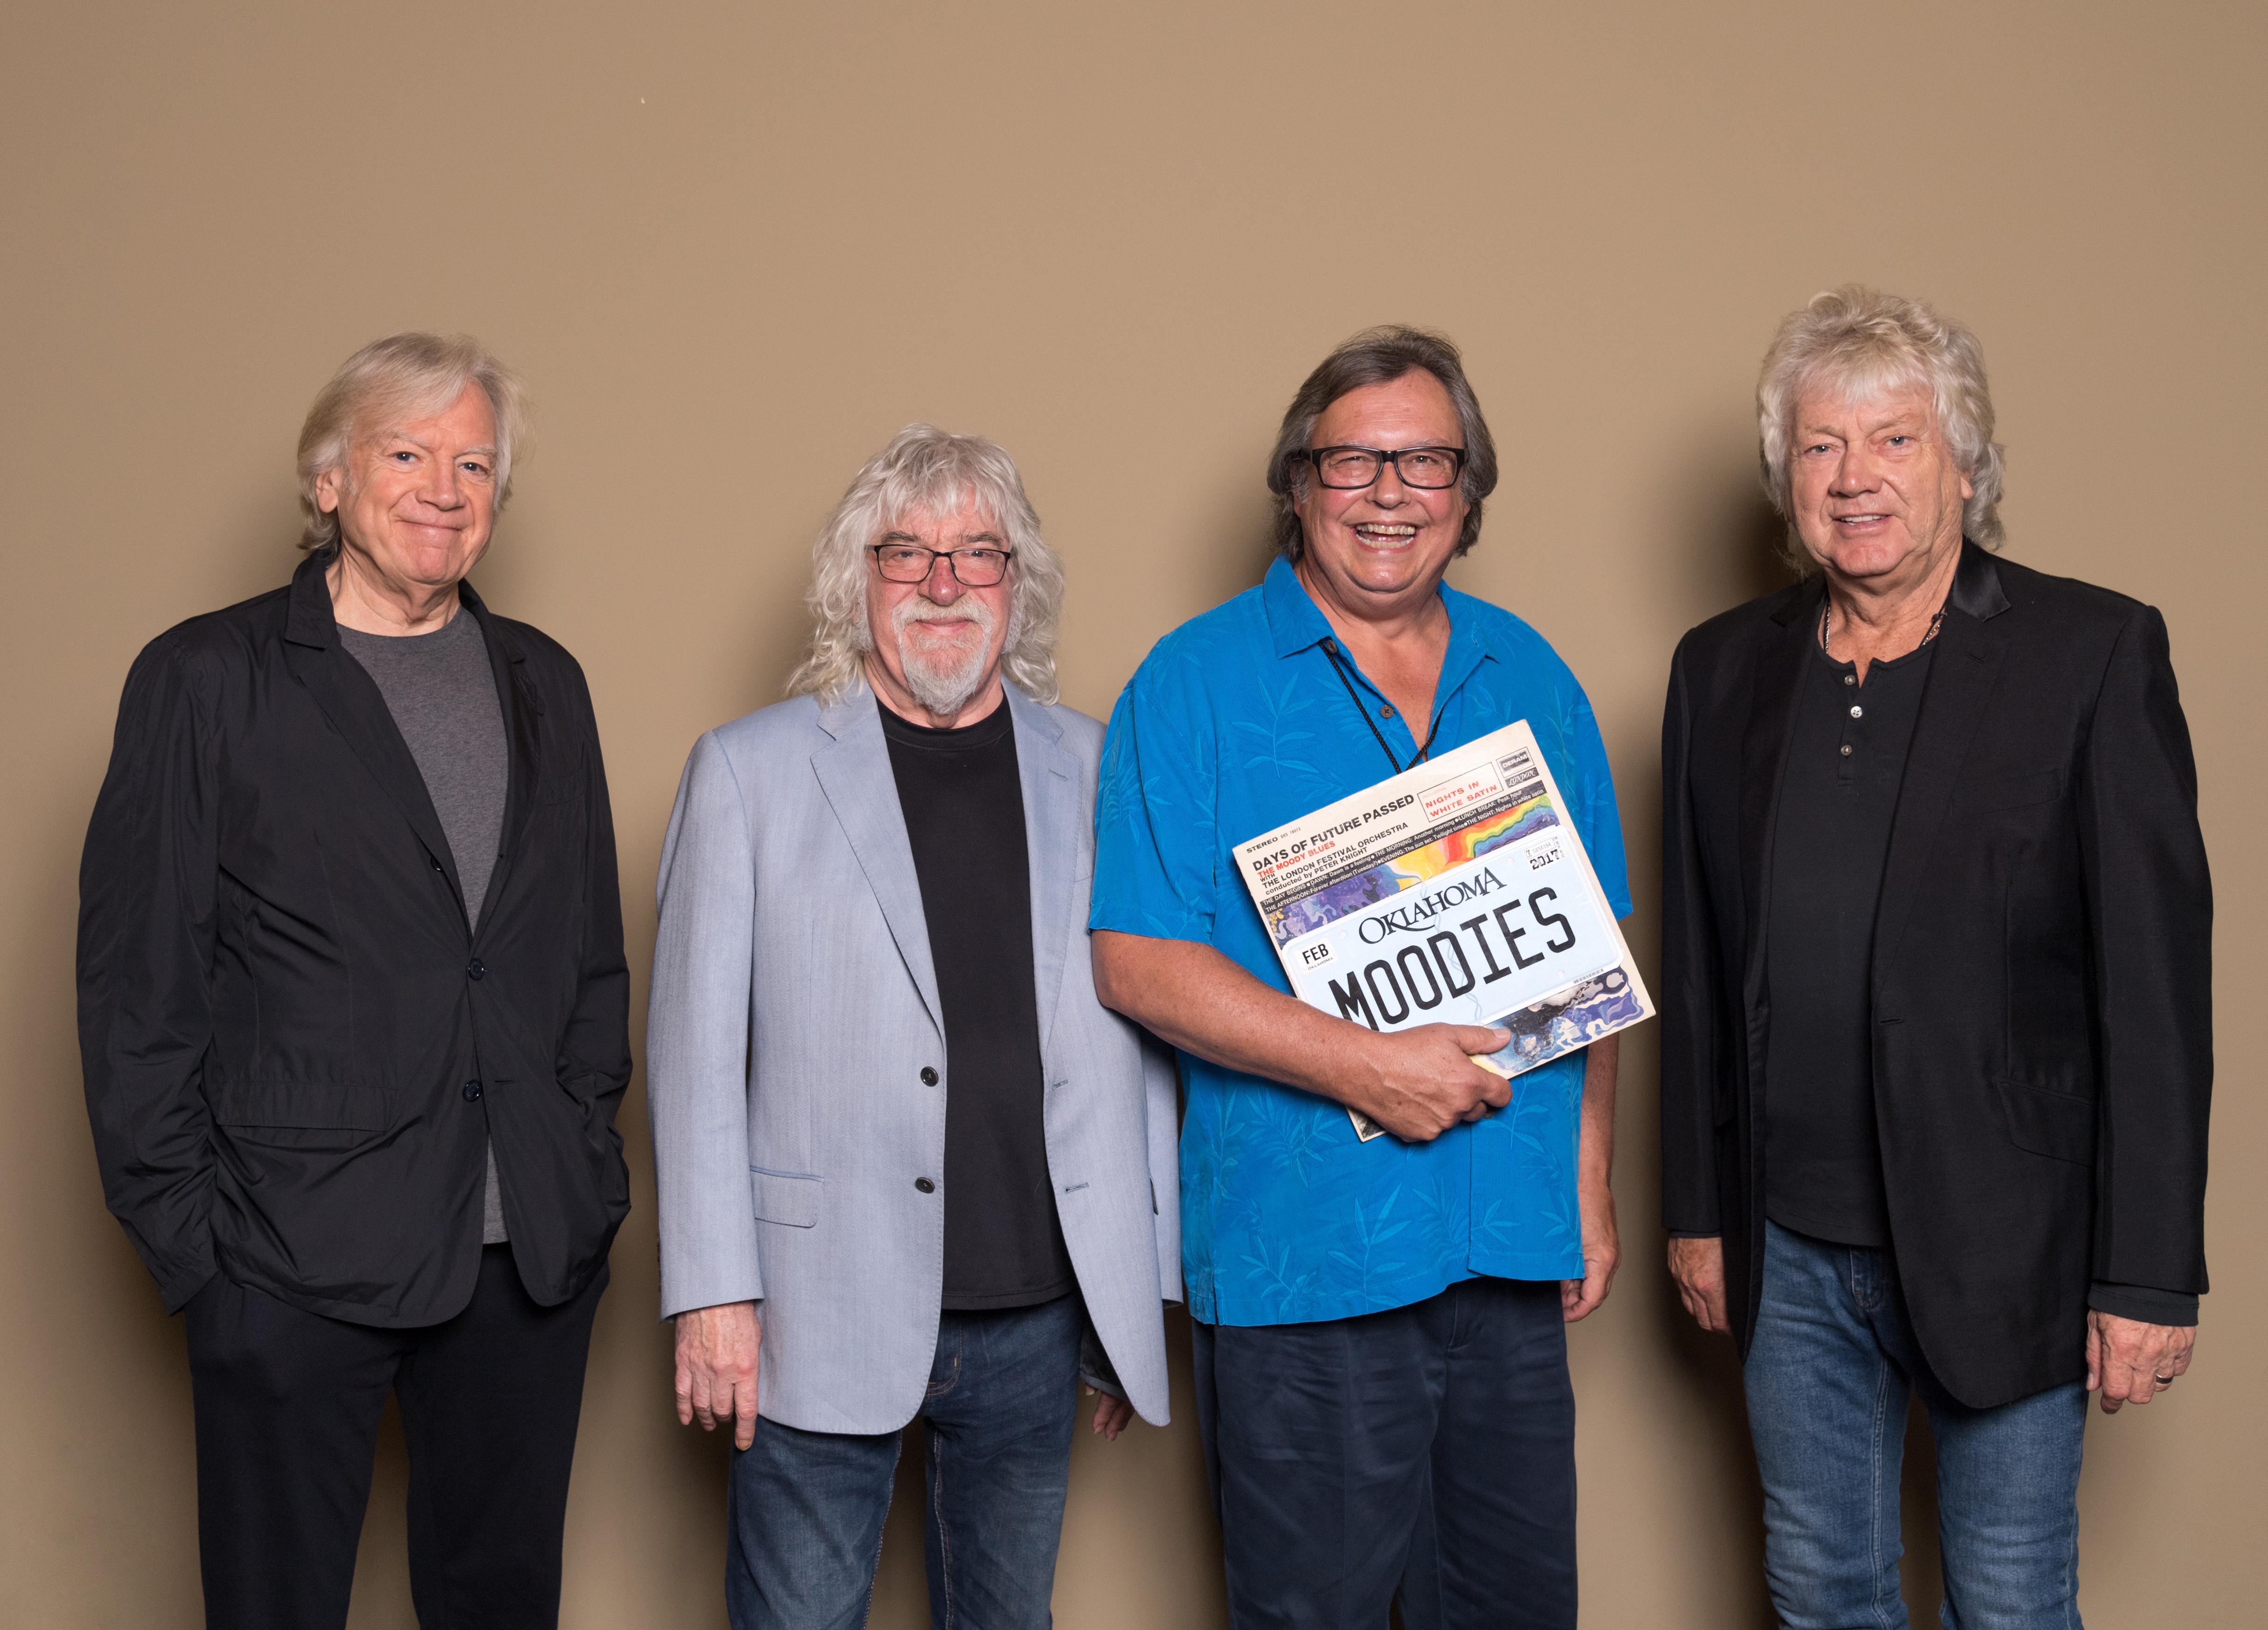 07-22-17 – Ryman Auditorium – Nashville, TN - The Moody Blues